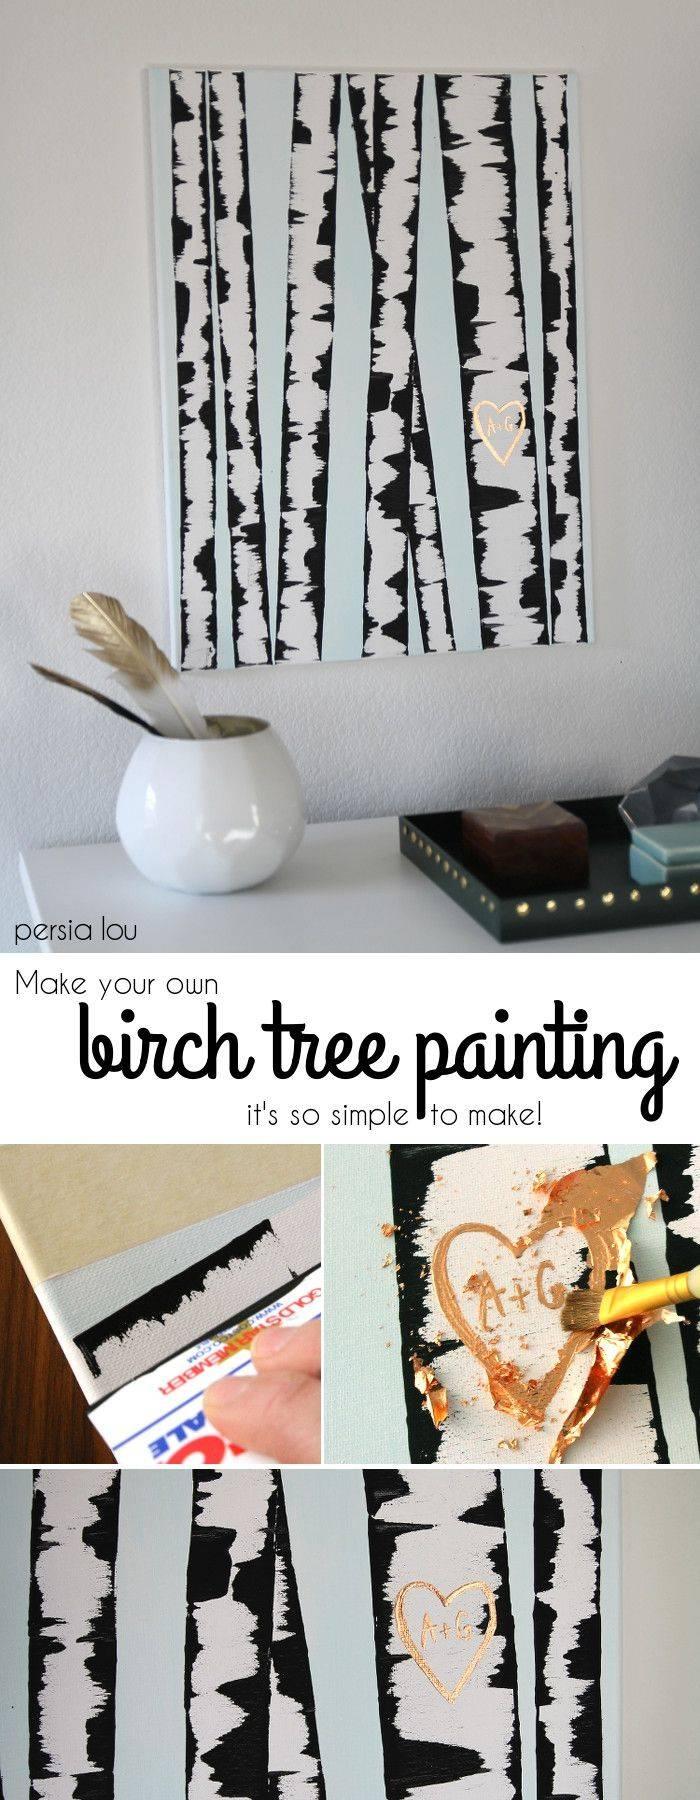 25+ Unique Diy Wall Decor Ideas On Pinterest | Diy Wall Art In Current Pinterest Wall Art Decor (View 3 of 25)